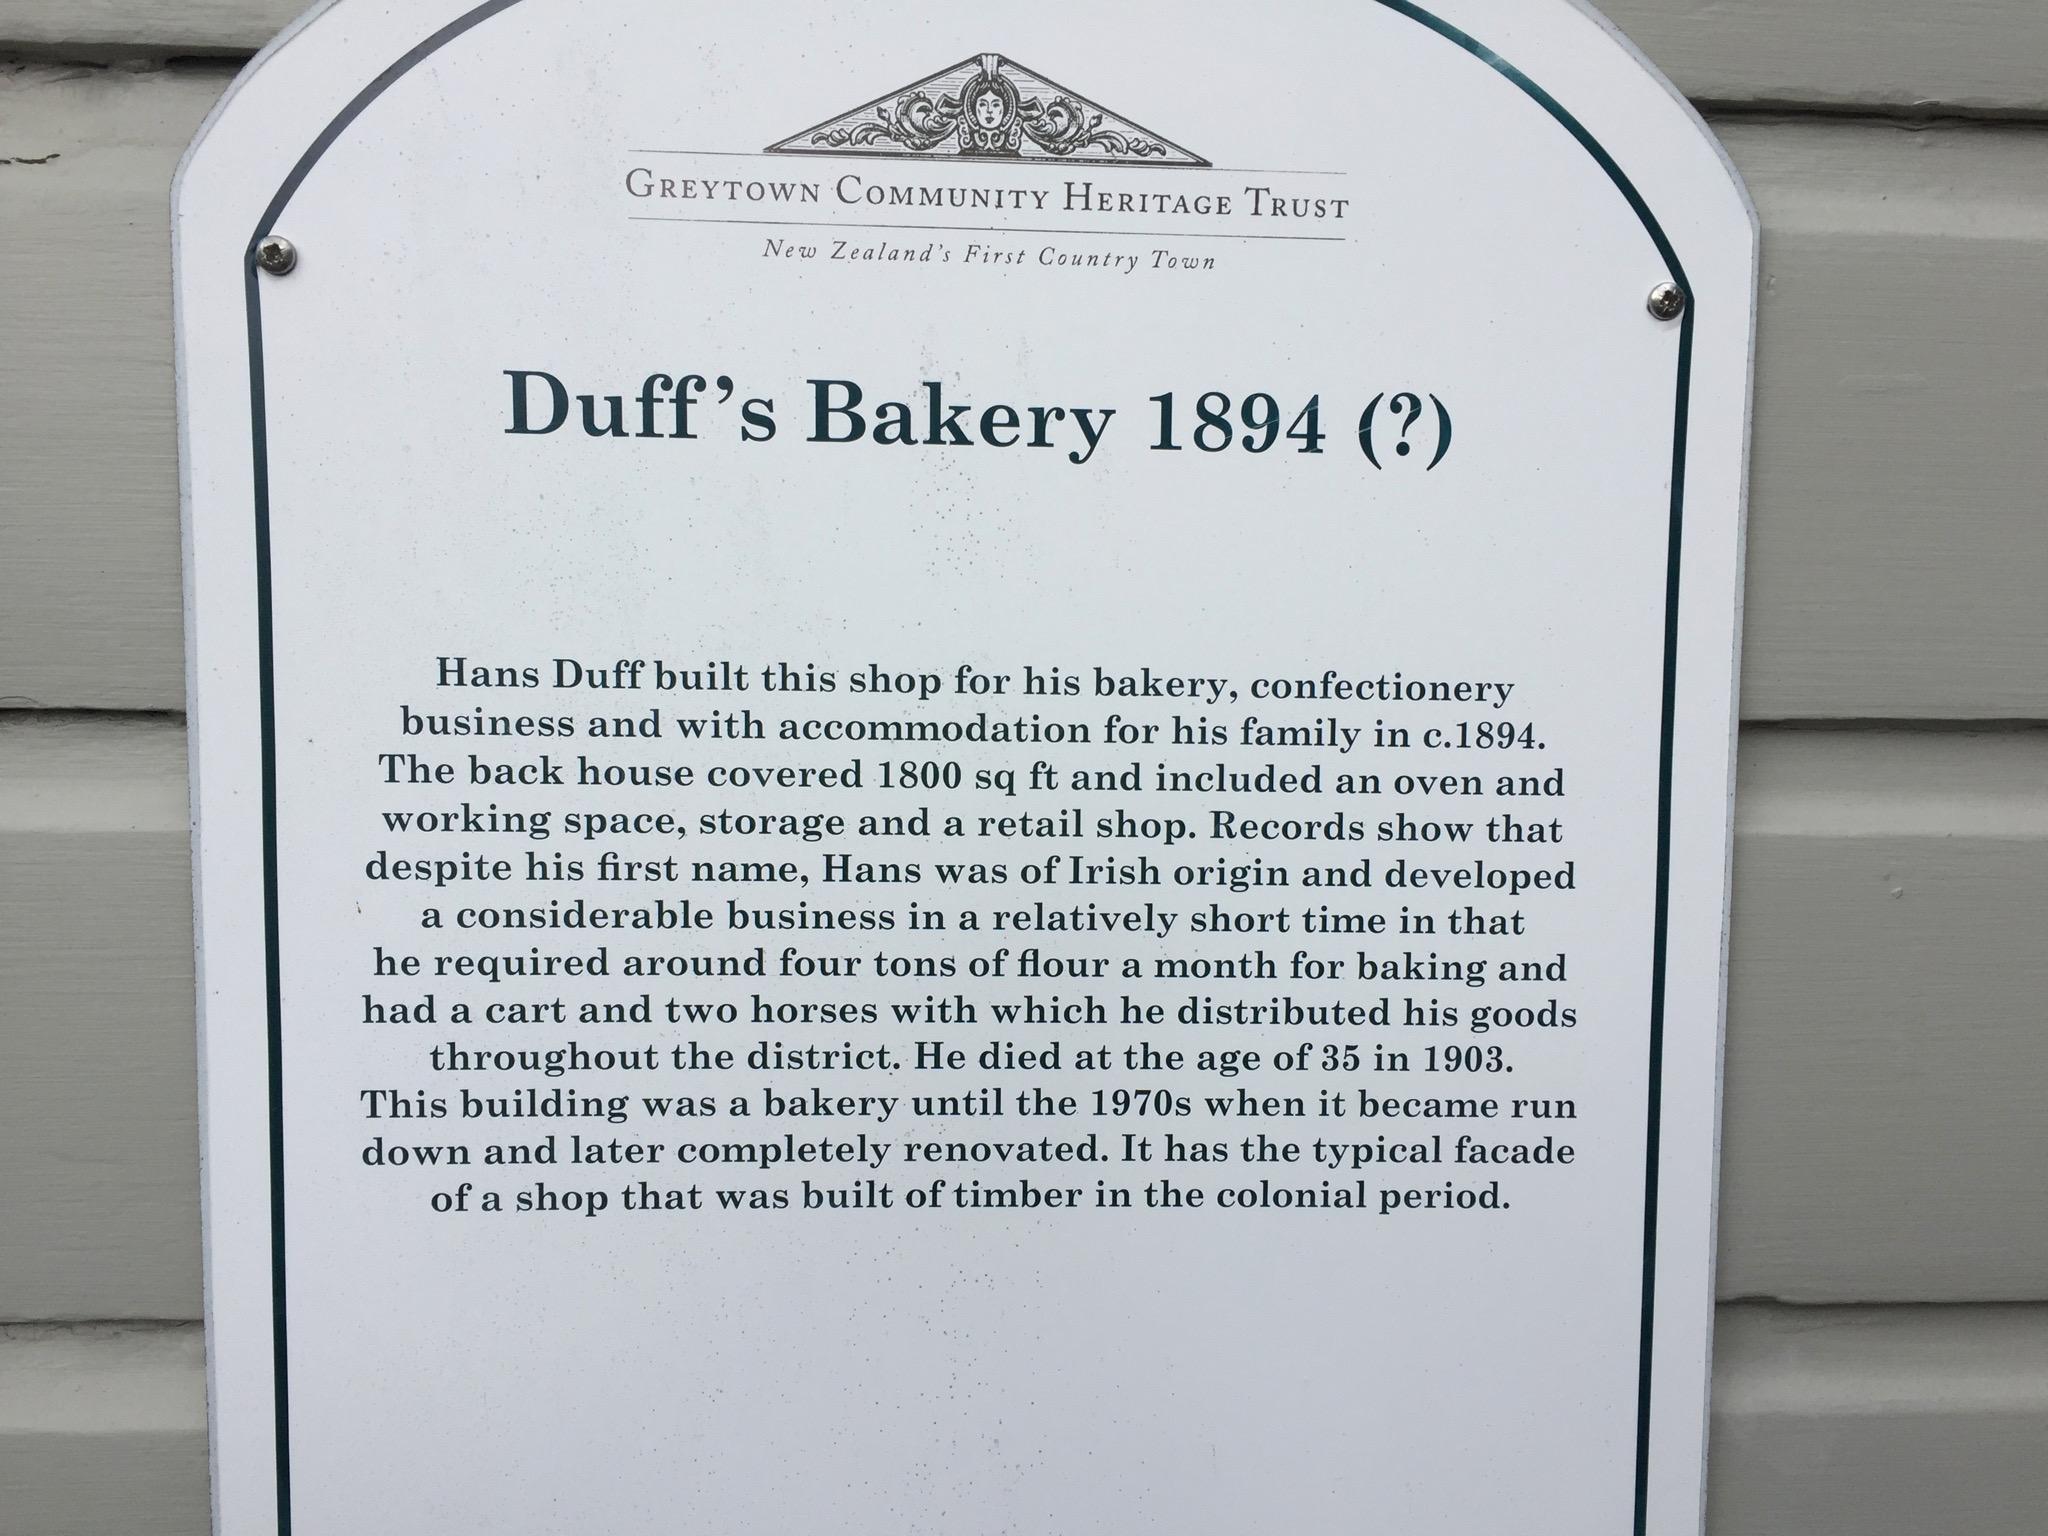 Duff's bakery, Greytown